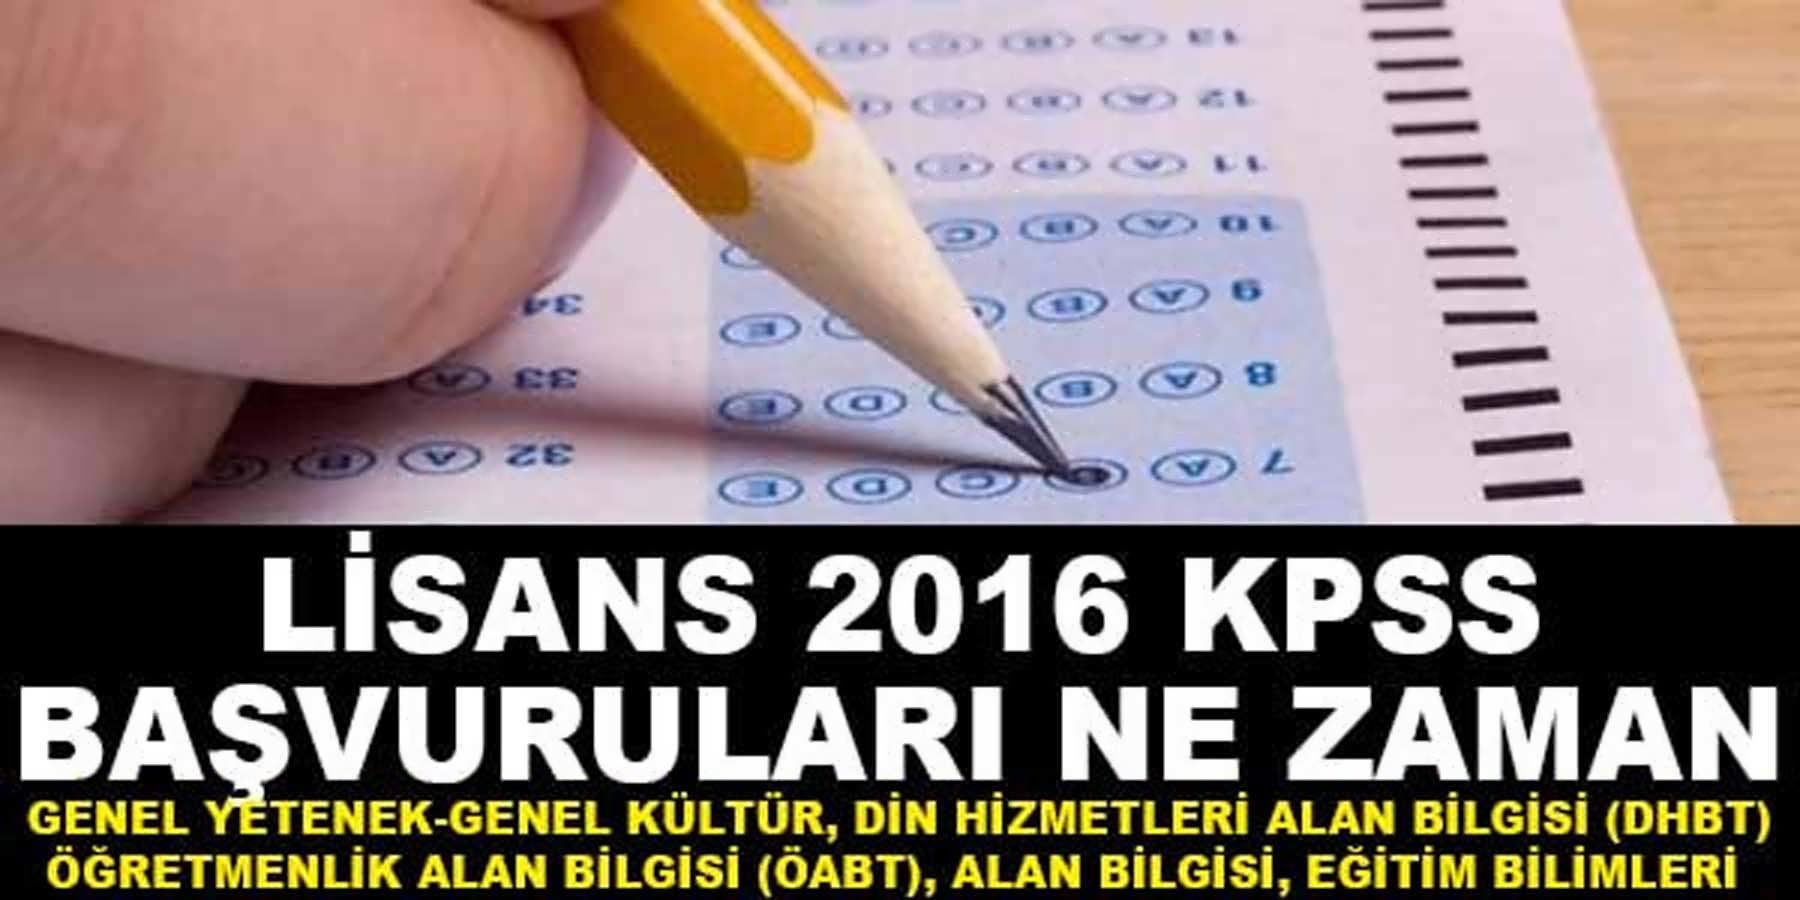 LİSANS 2016 KPSS BAŞVURULARI